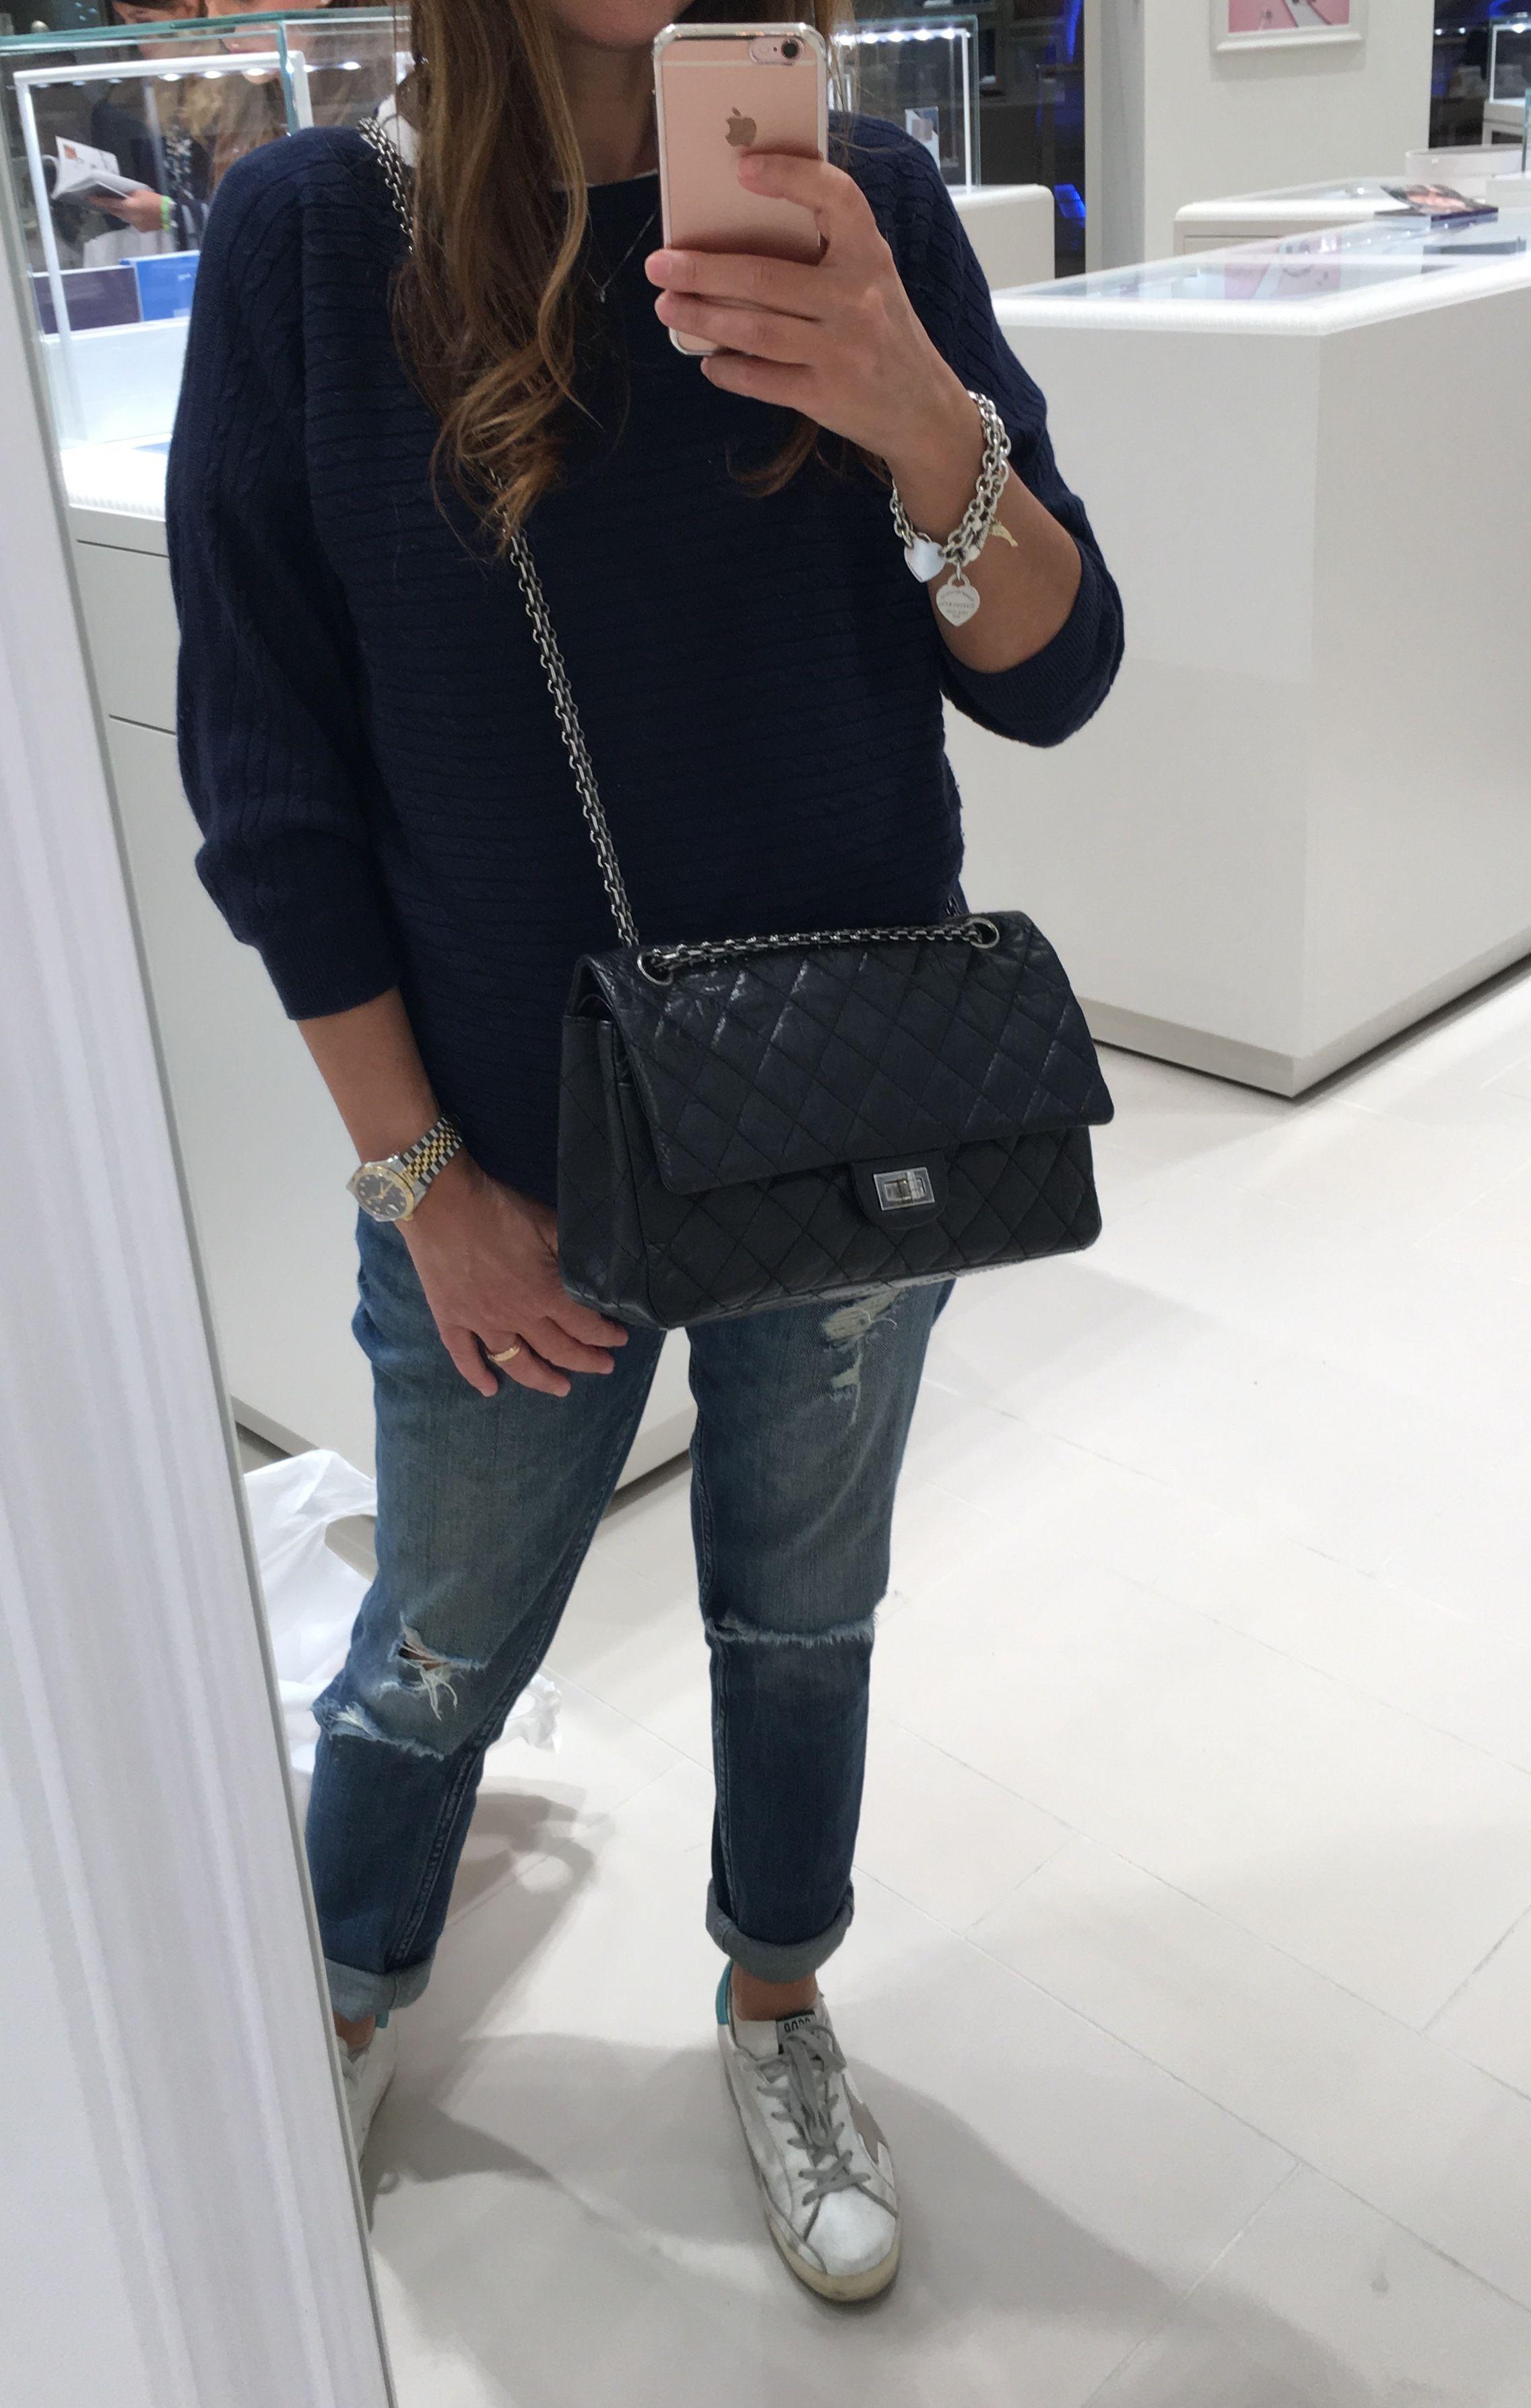 My Chanel Reissue Bag 226 Chanel Reissue Chanel Handbags Chanel